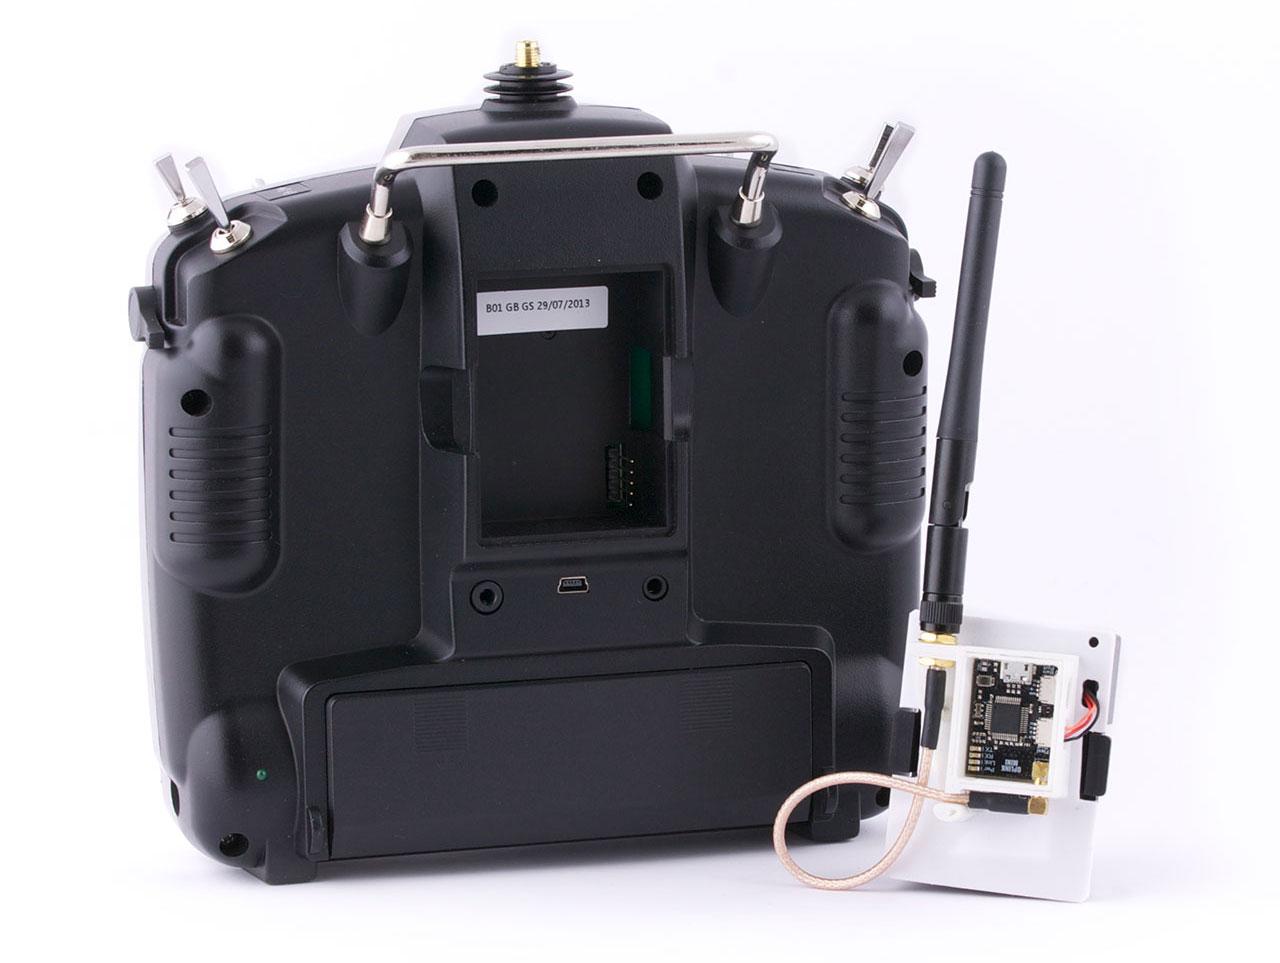 Oplm Vehicle Control Link Librepilot Openpilot Wiki 014 Cc3d Atom Wiring Diagram Mounting The Oplink Module To Transmitter